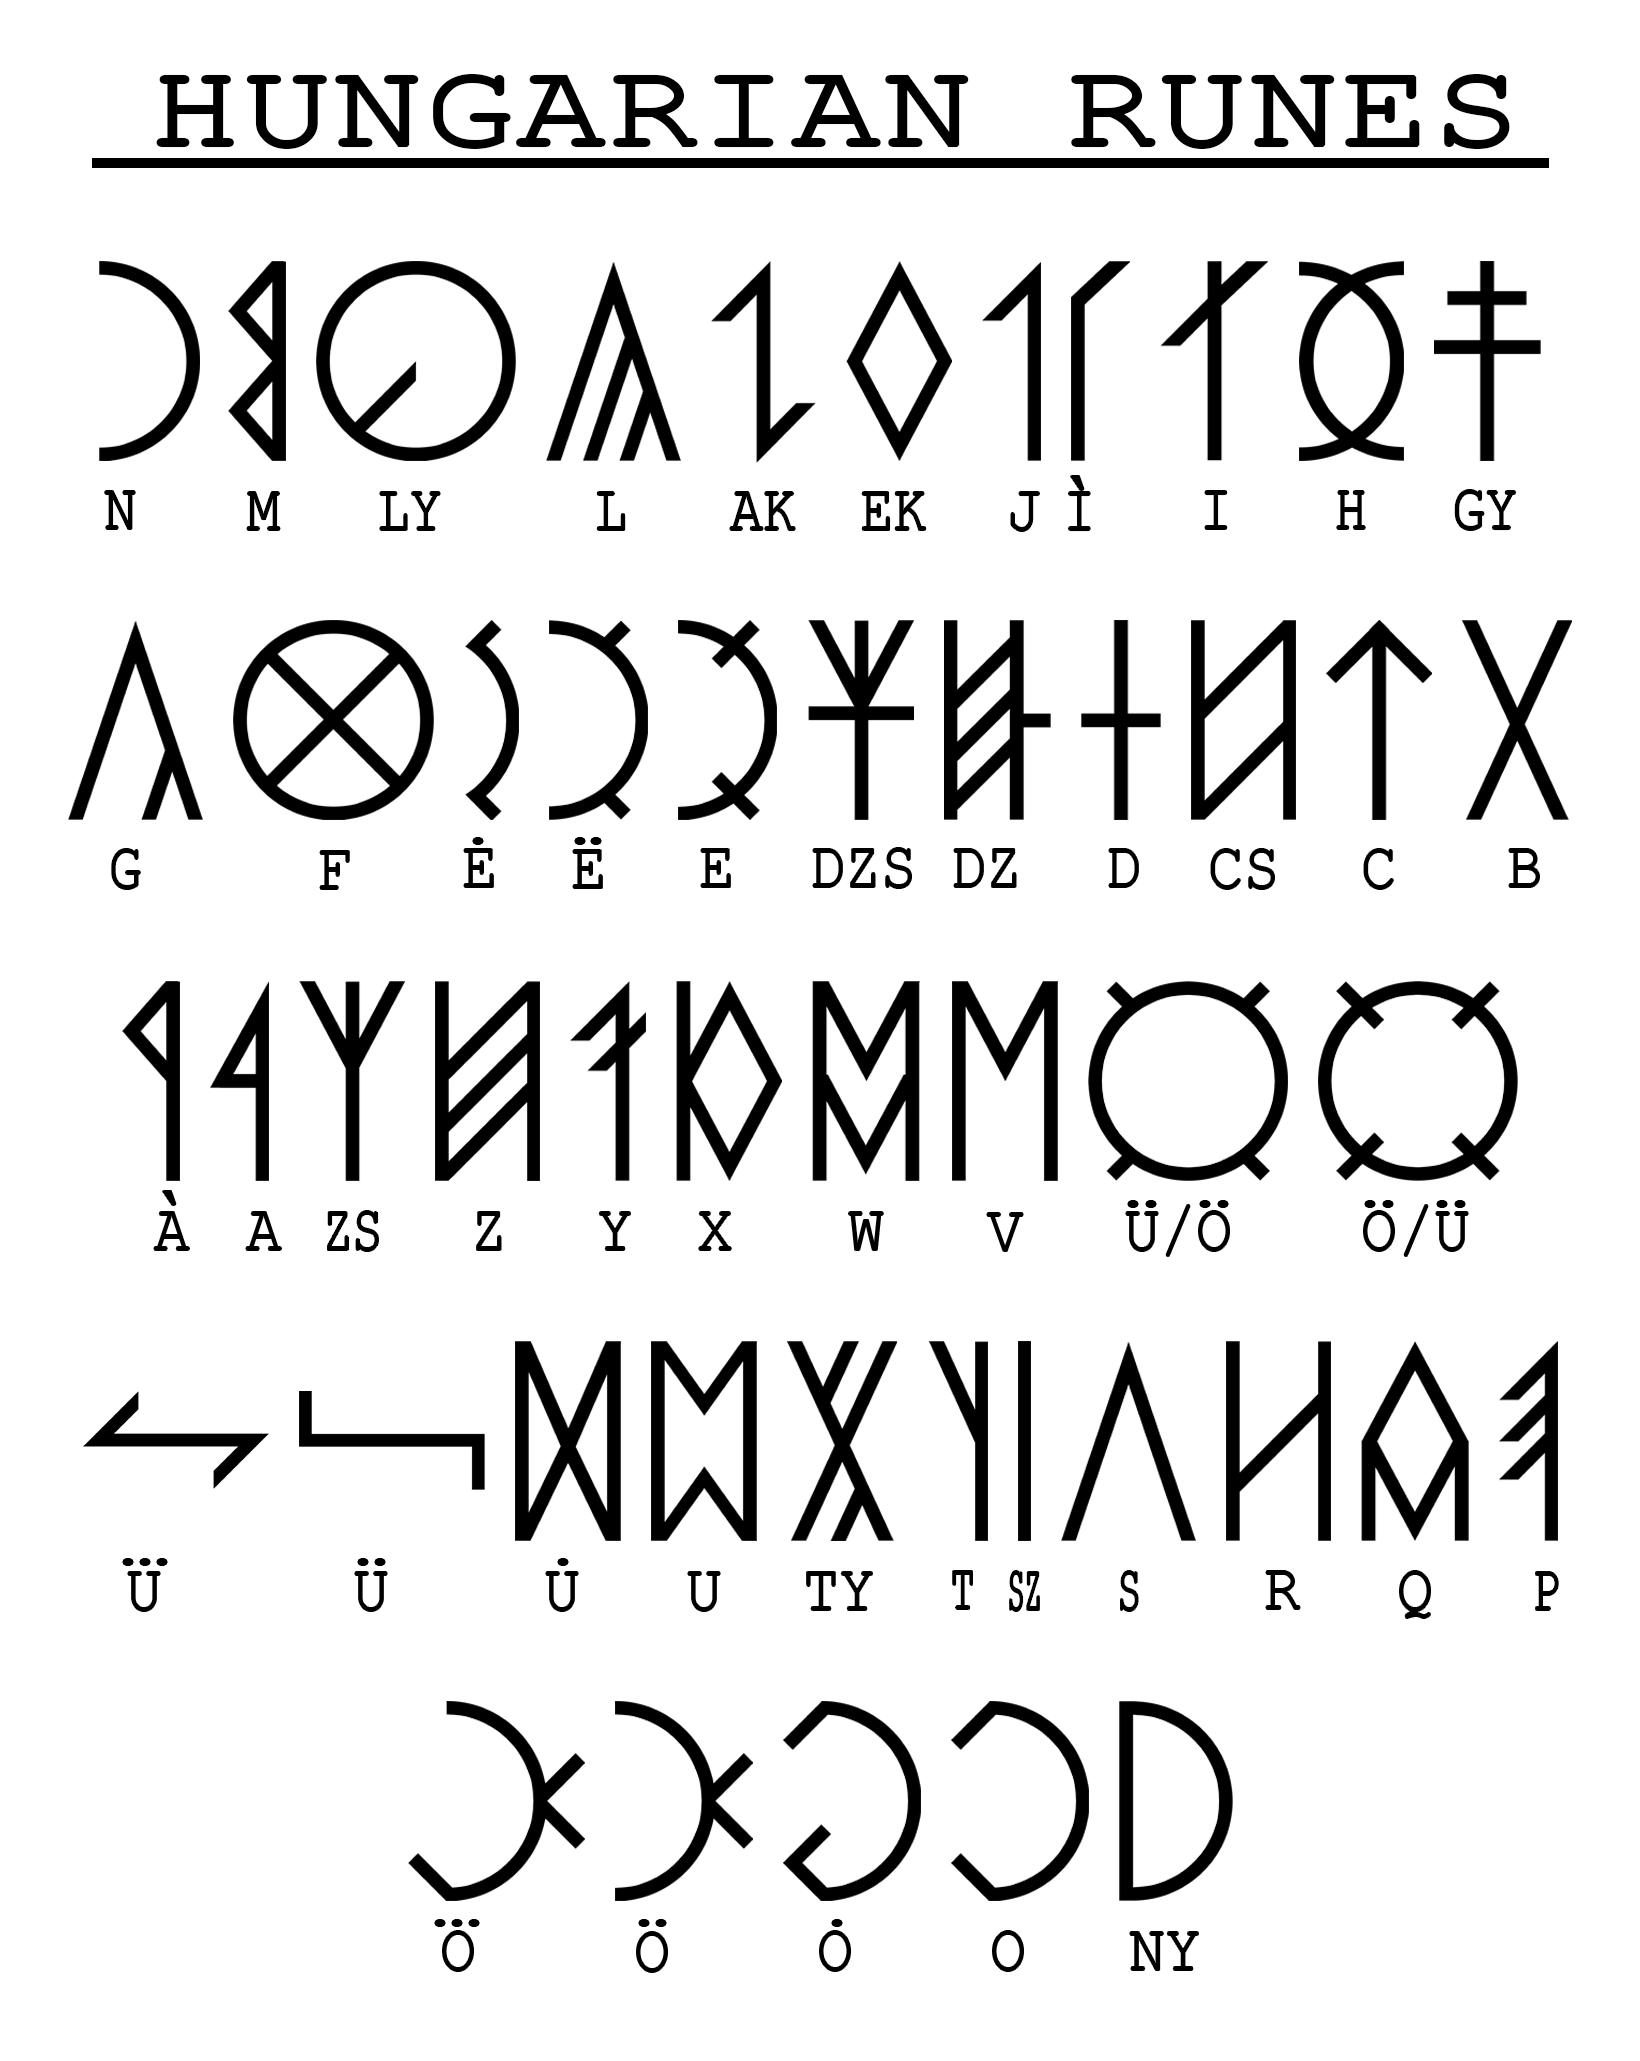 Old Hungarian Runes Alphabet By Lovemystarfire On